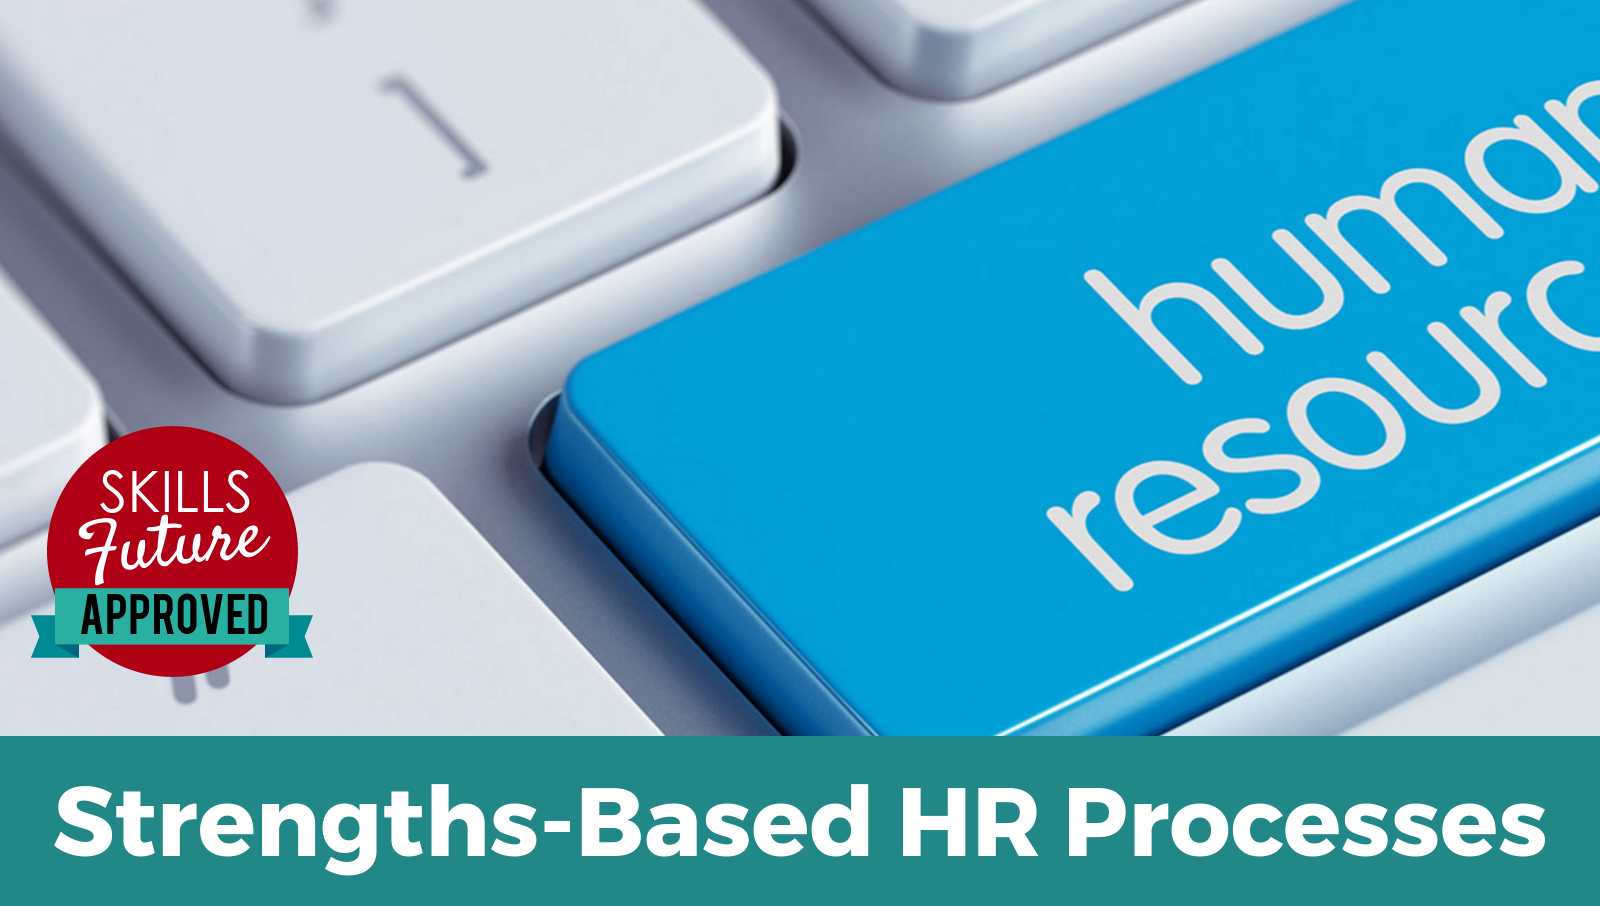 Strengths Based HR Processes Singapore Skillsfuture event